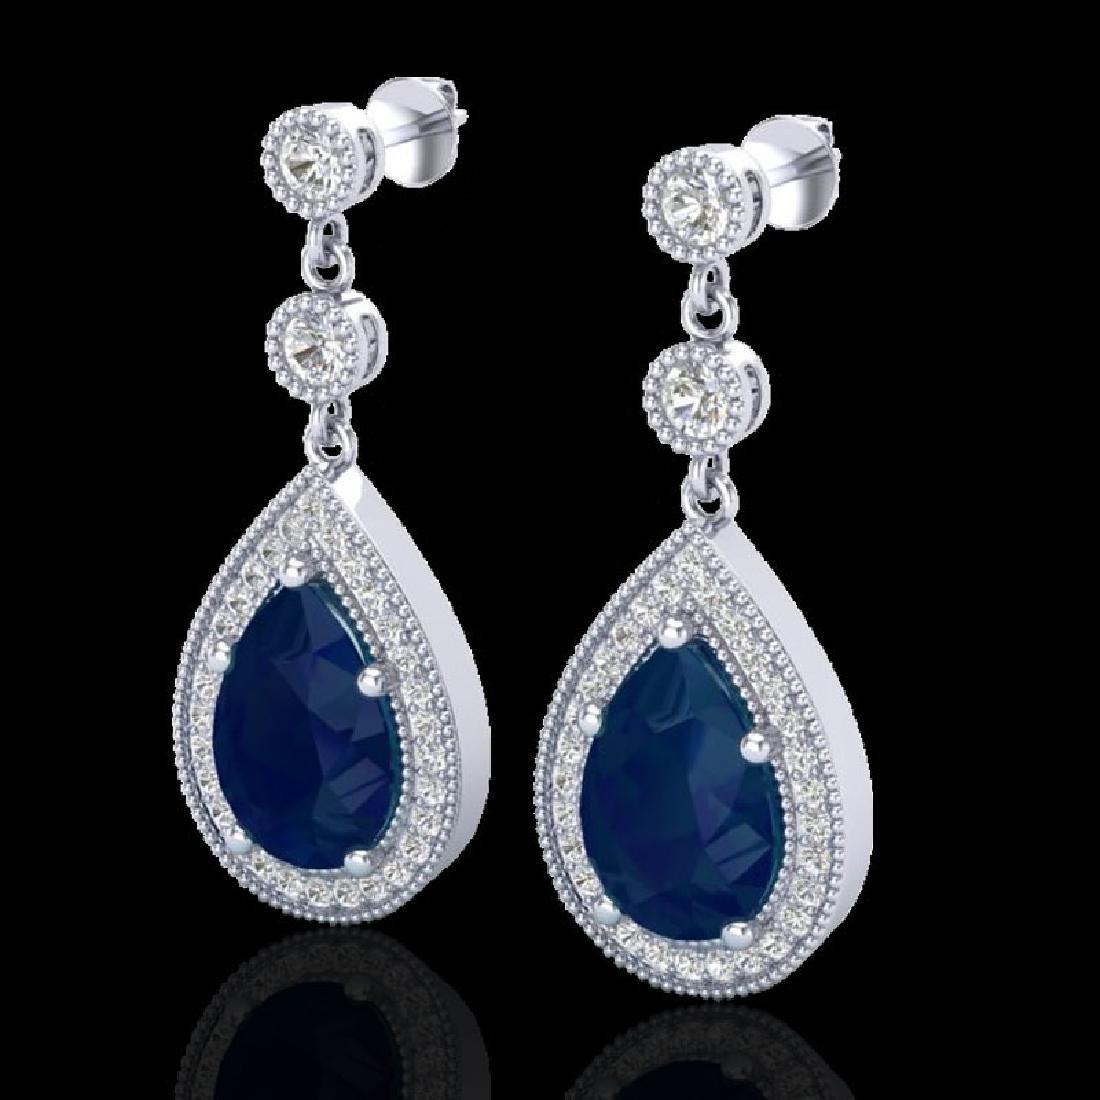 6 CTW Sapphire & Micro Pave VS/SI Diamond Earrings